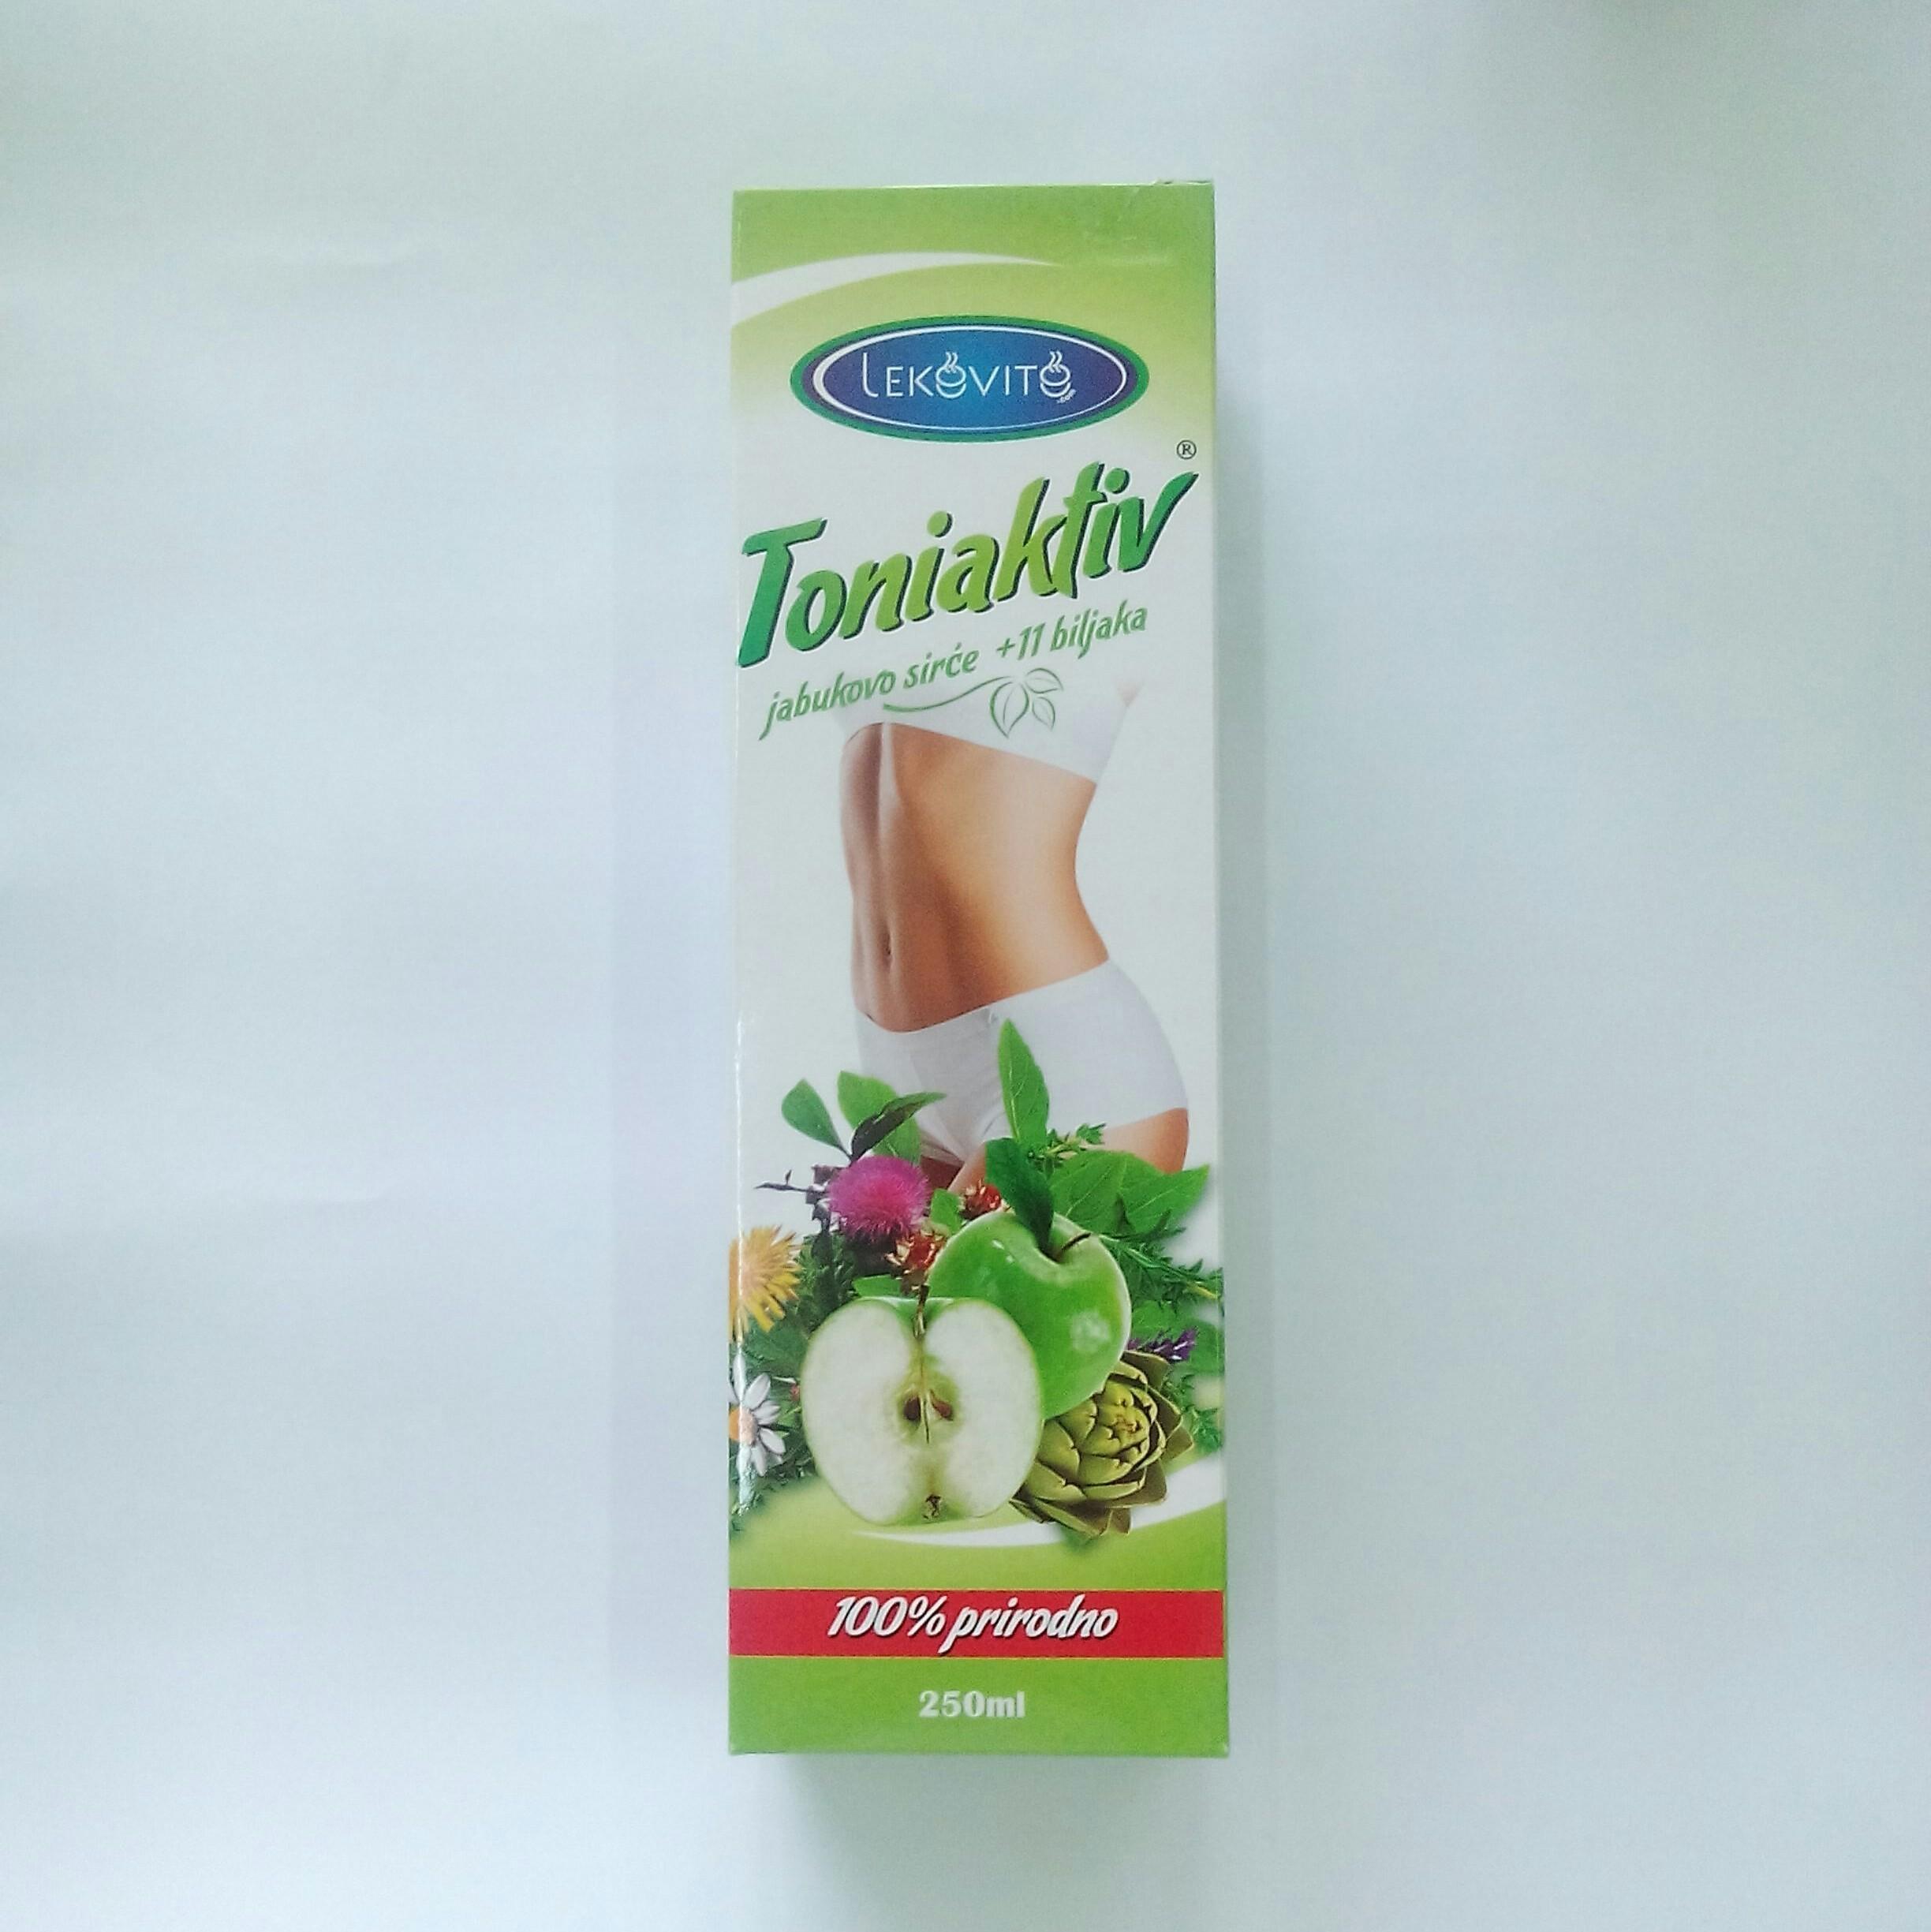 Toniaktiv (jabukovo sirće sa 11 biljaka) 250 ml Lekovito 00314